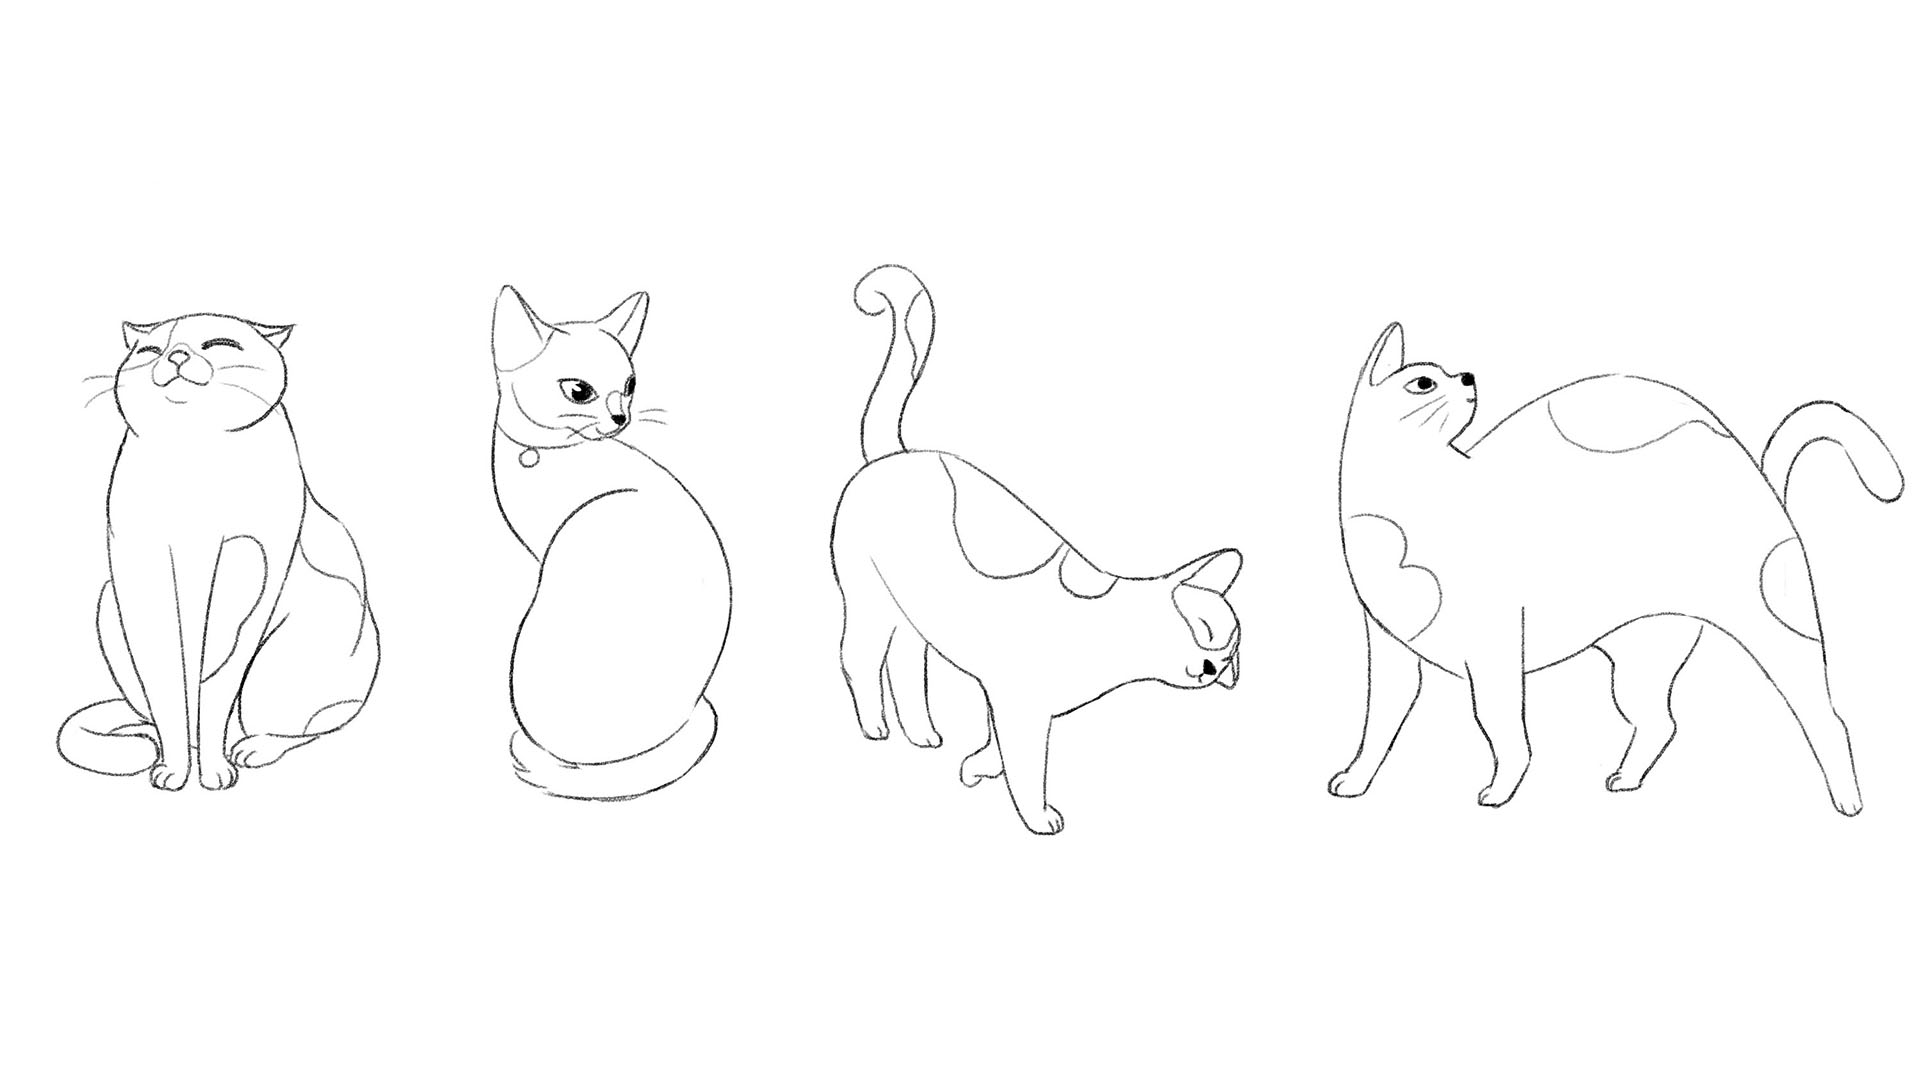 Chickflia_cat sketch_v01.jpg